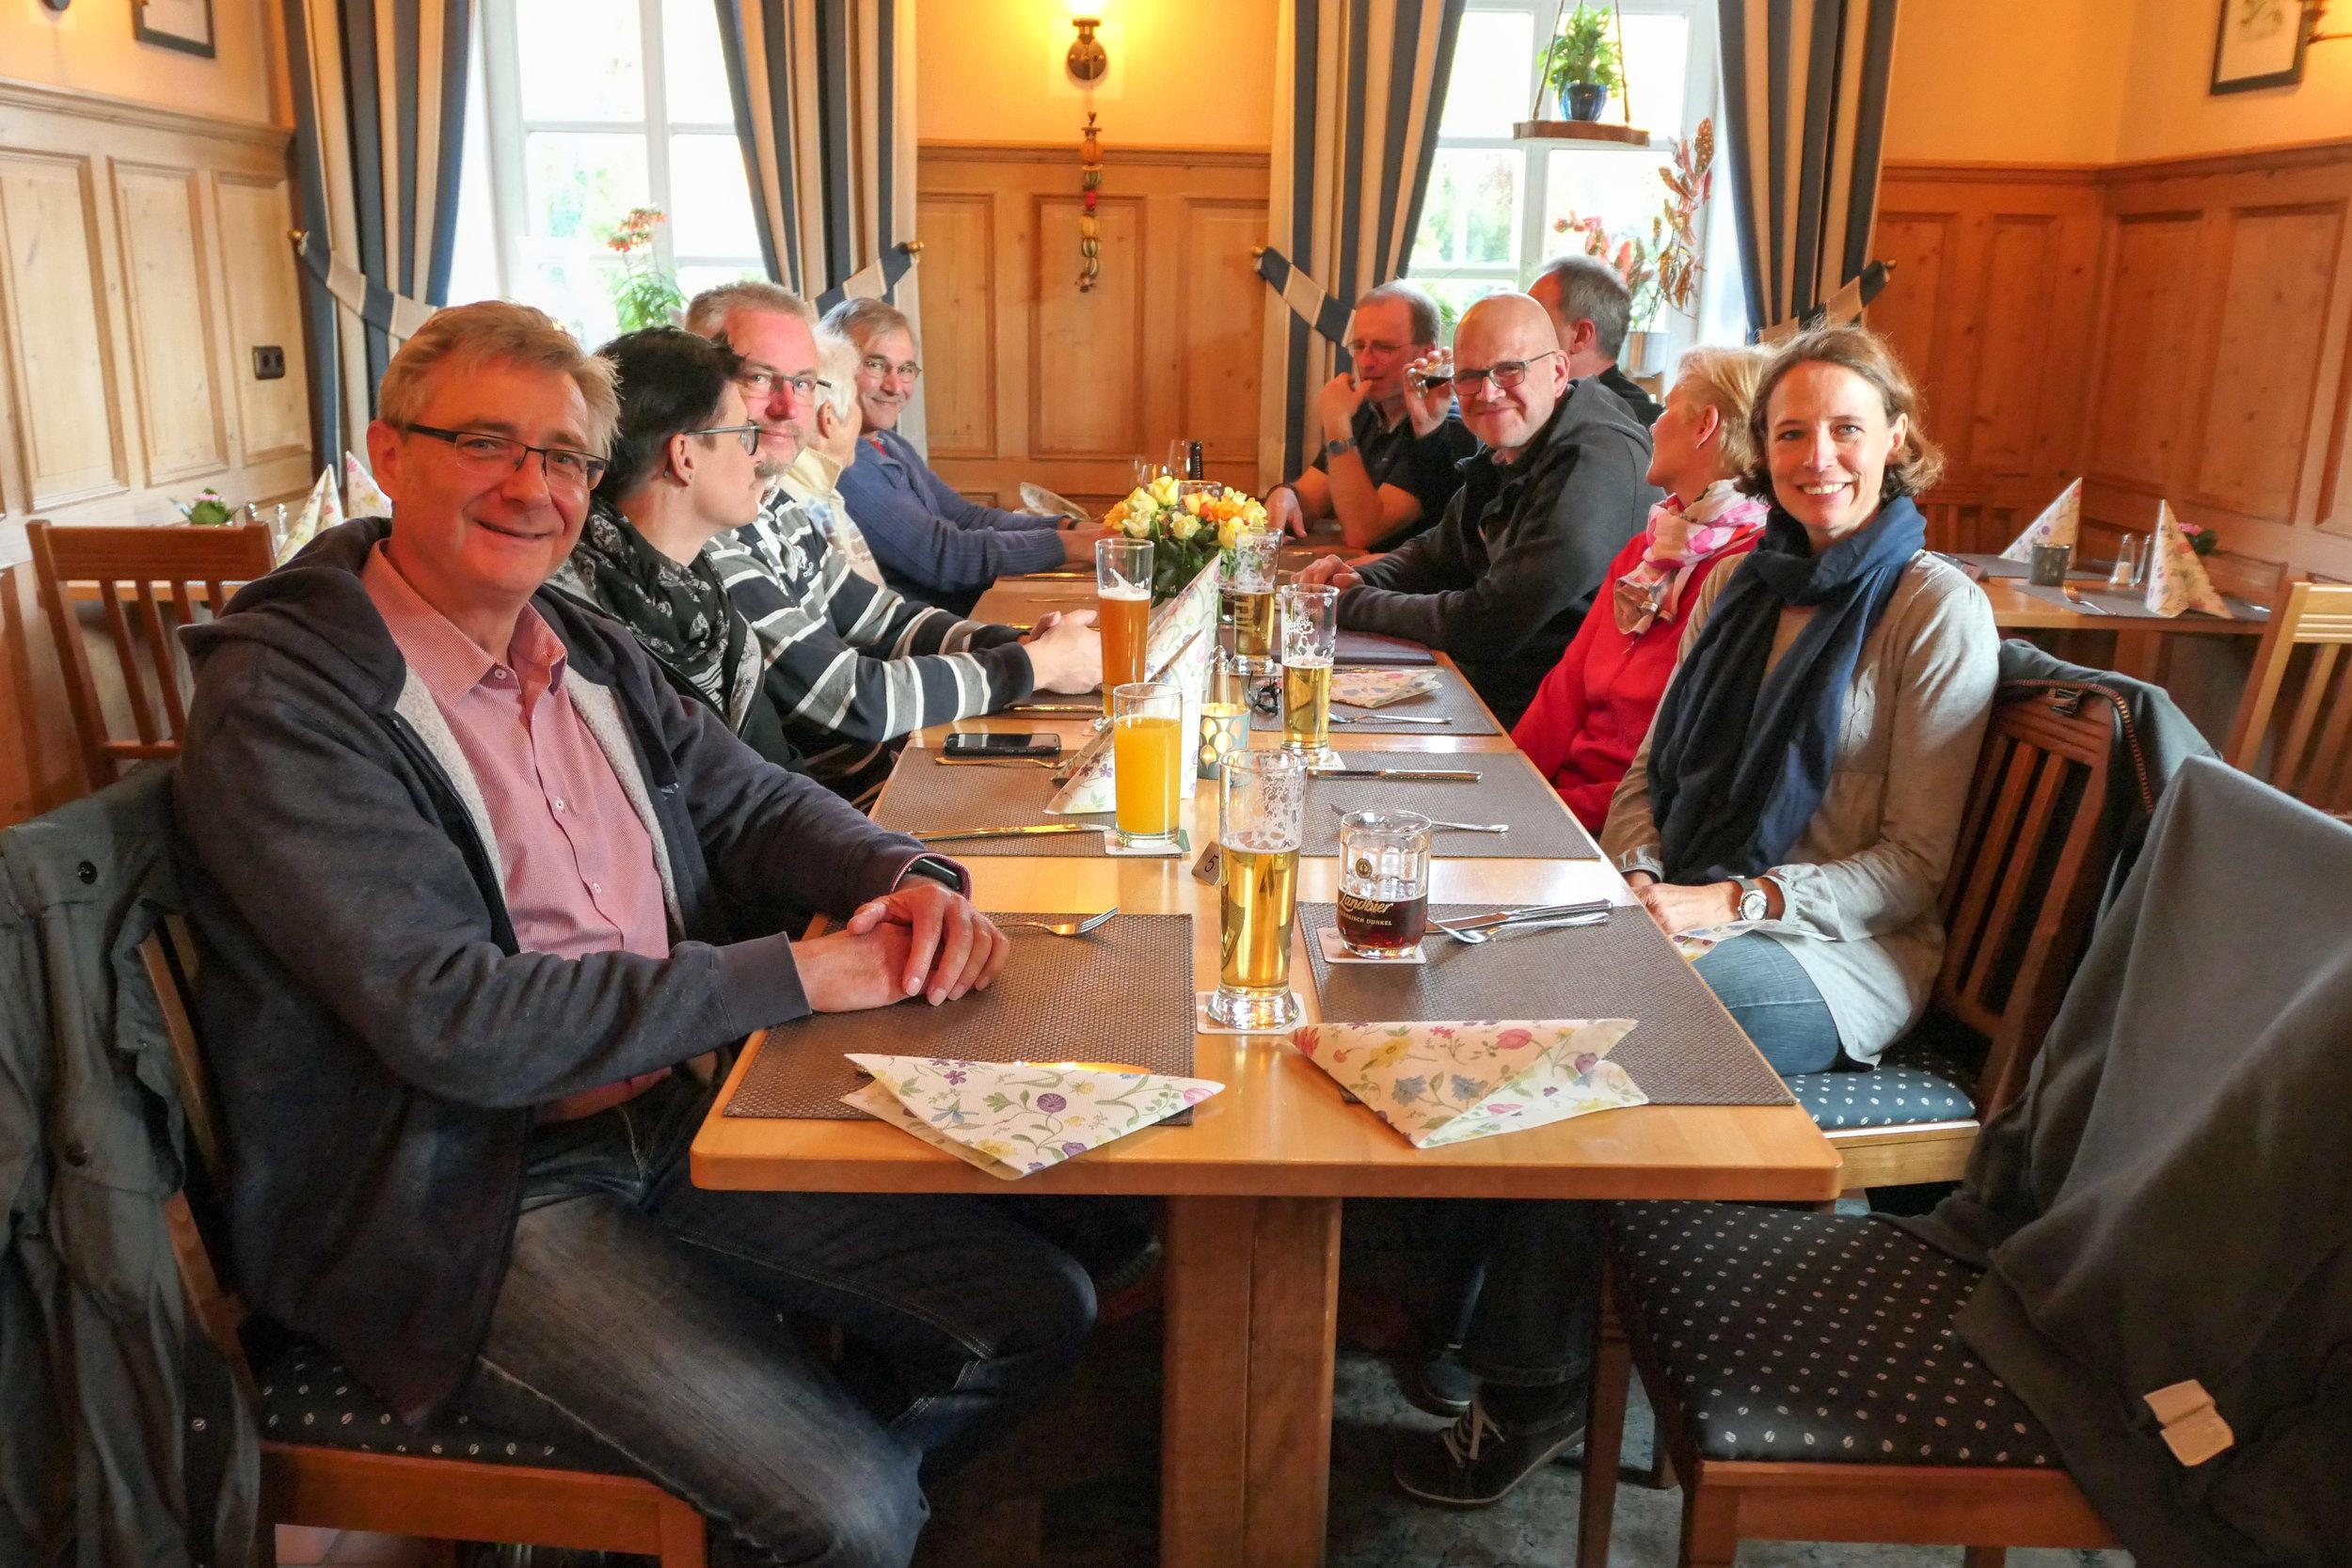 maiwanderfahrt-weser-2019-2_0089_2019-04-28_18-47-24.jpg